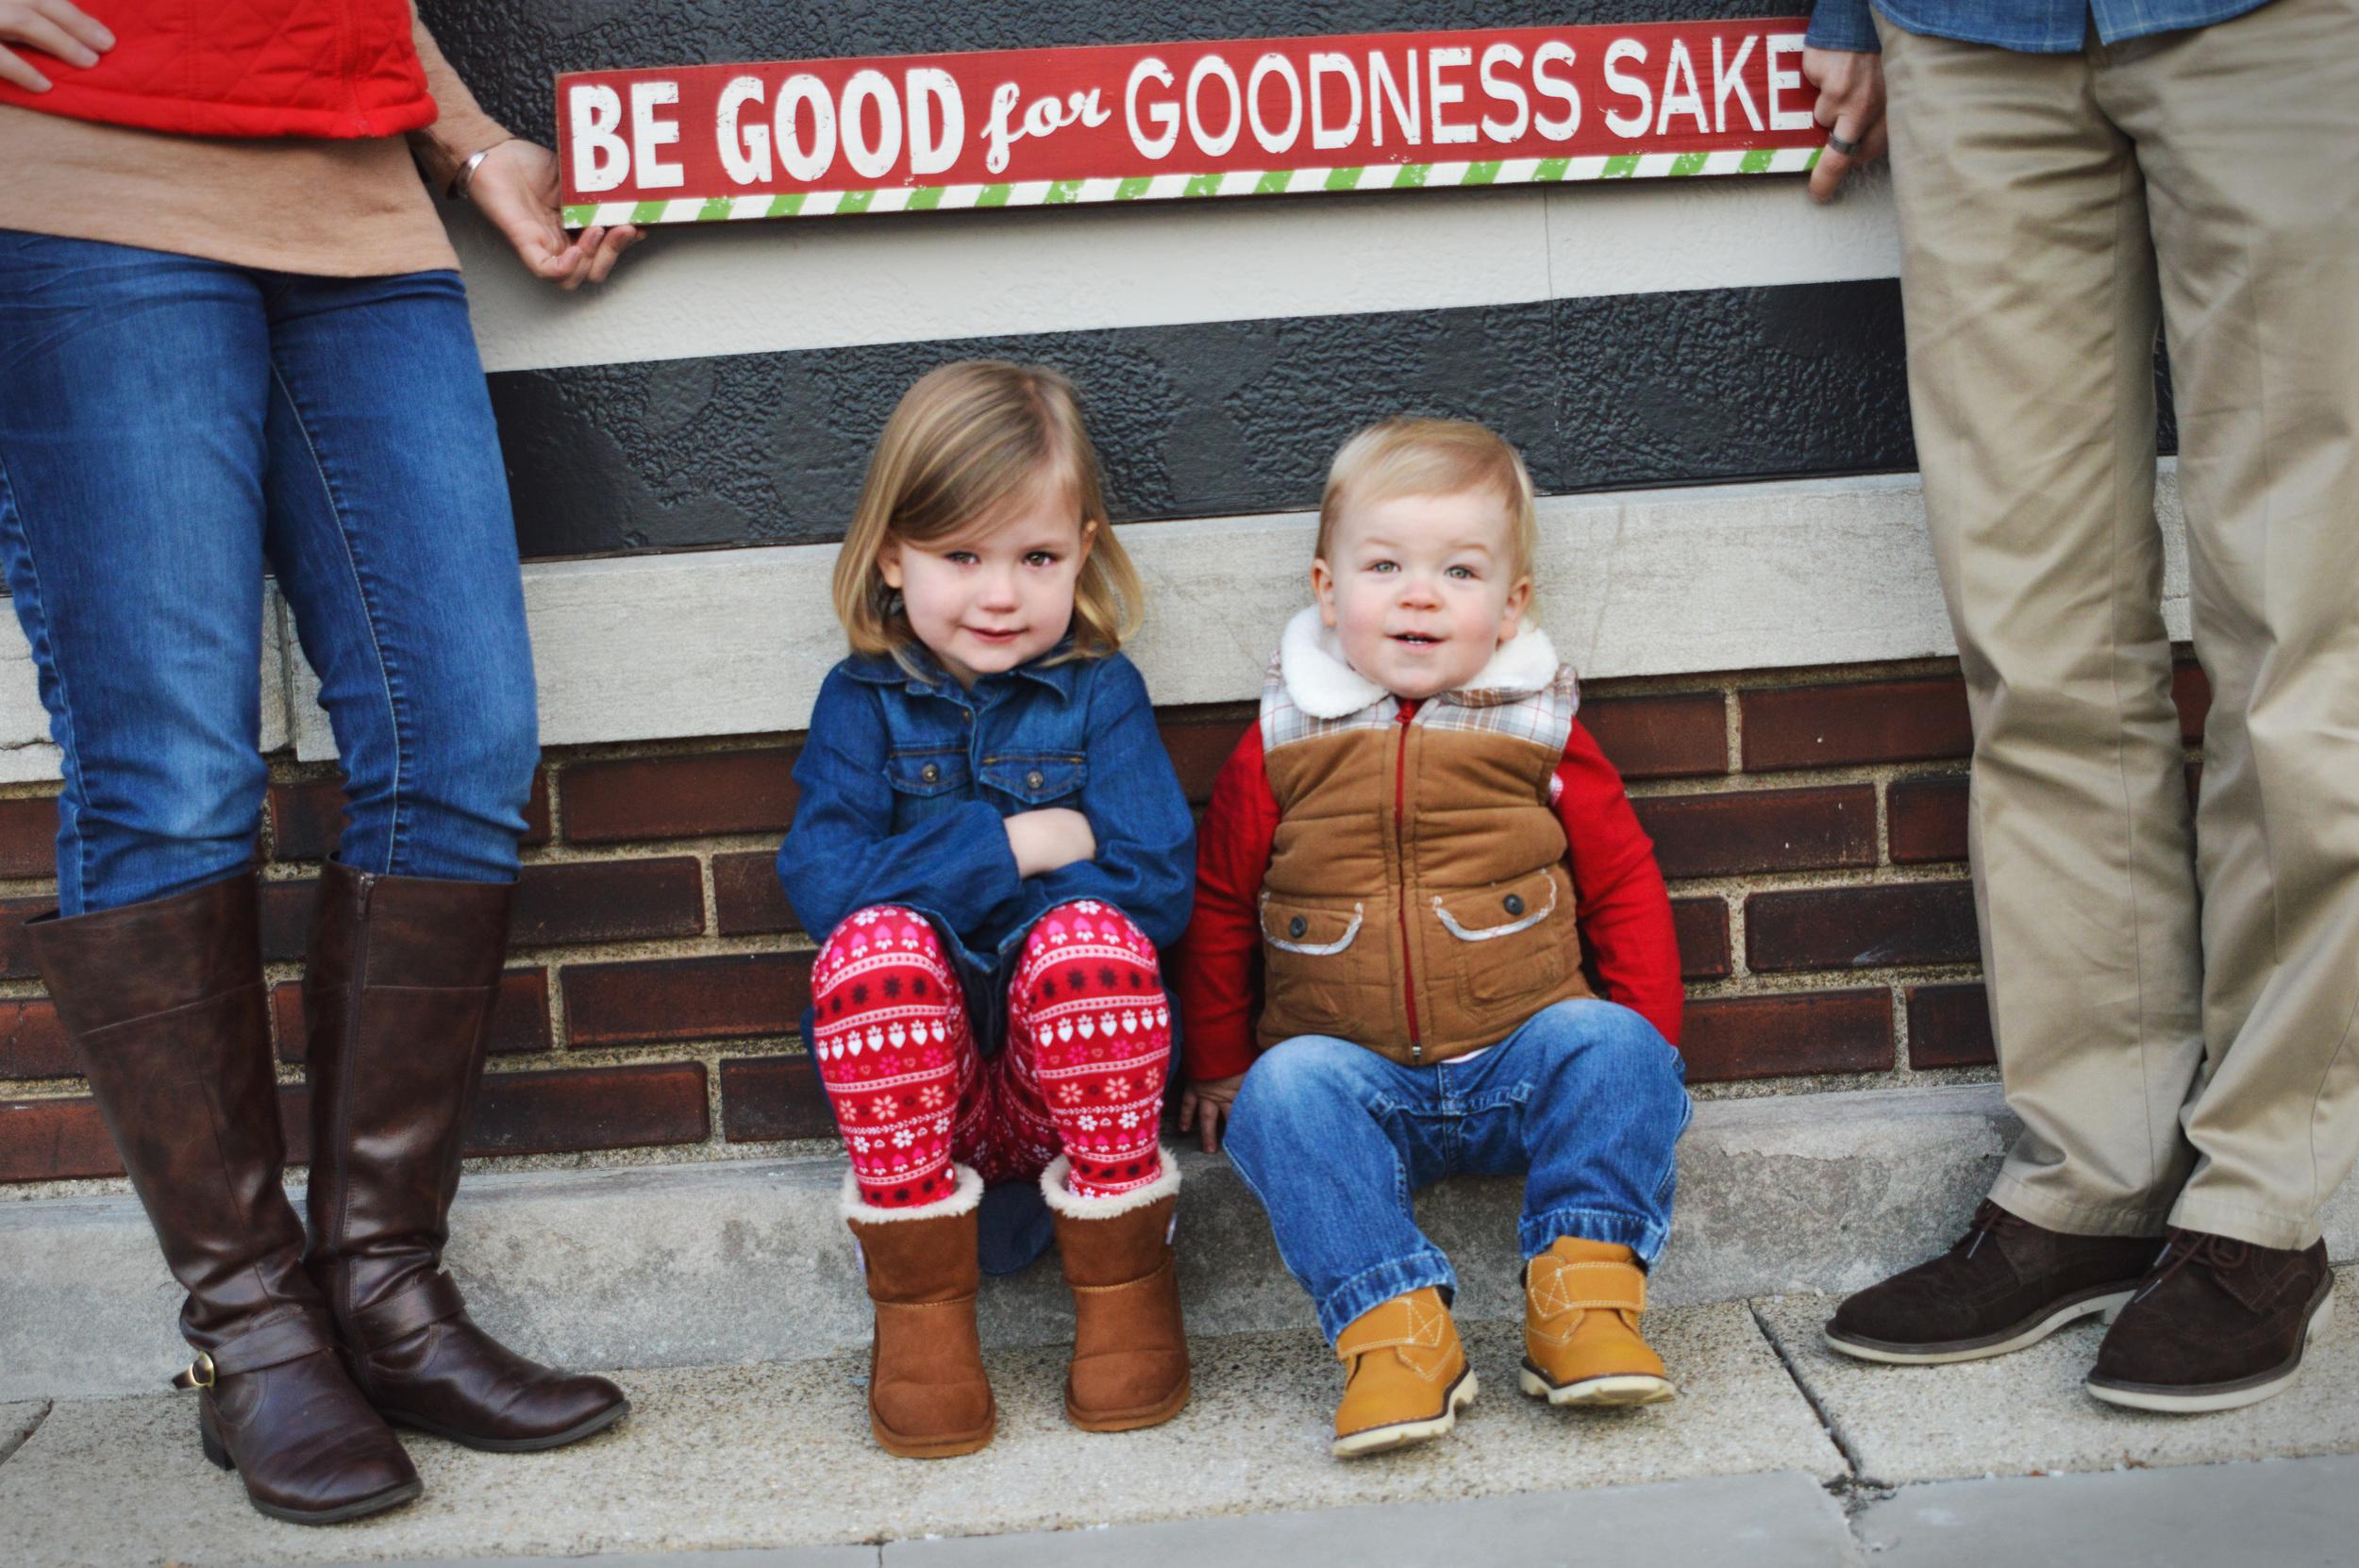 begoodforgoodnesssake-christmasphoto-familyphotos-joplinmissouri-photosbyariel